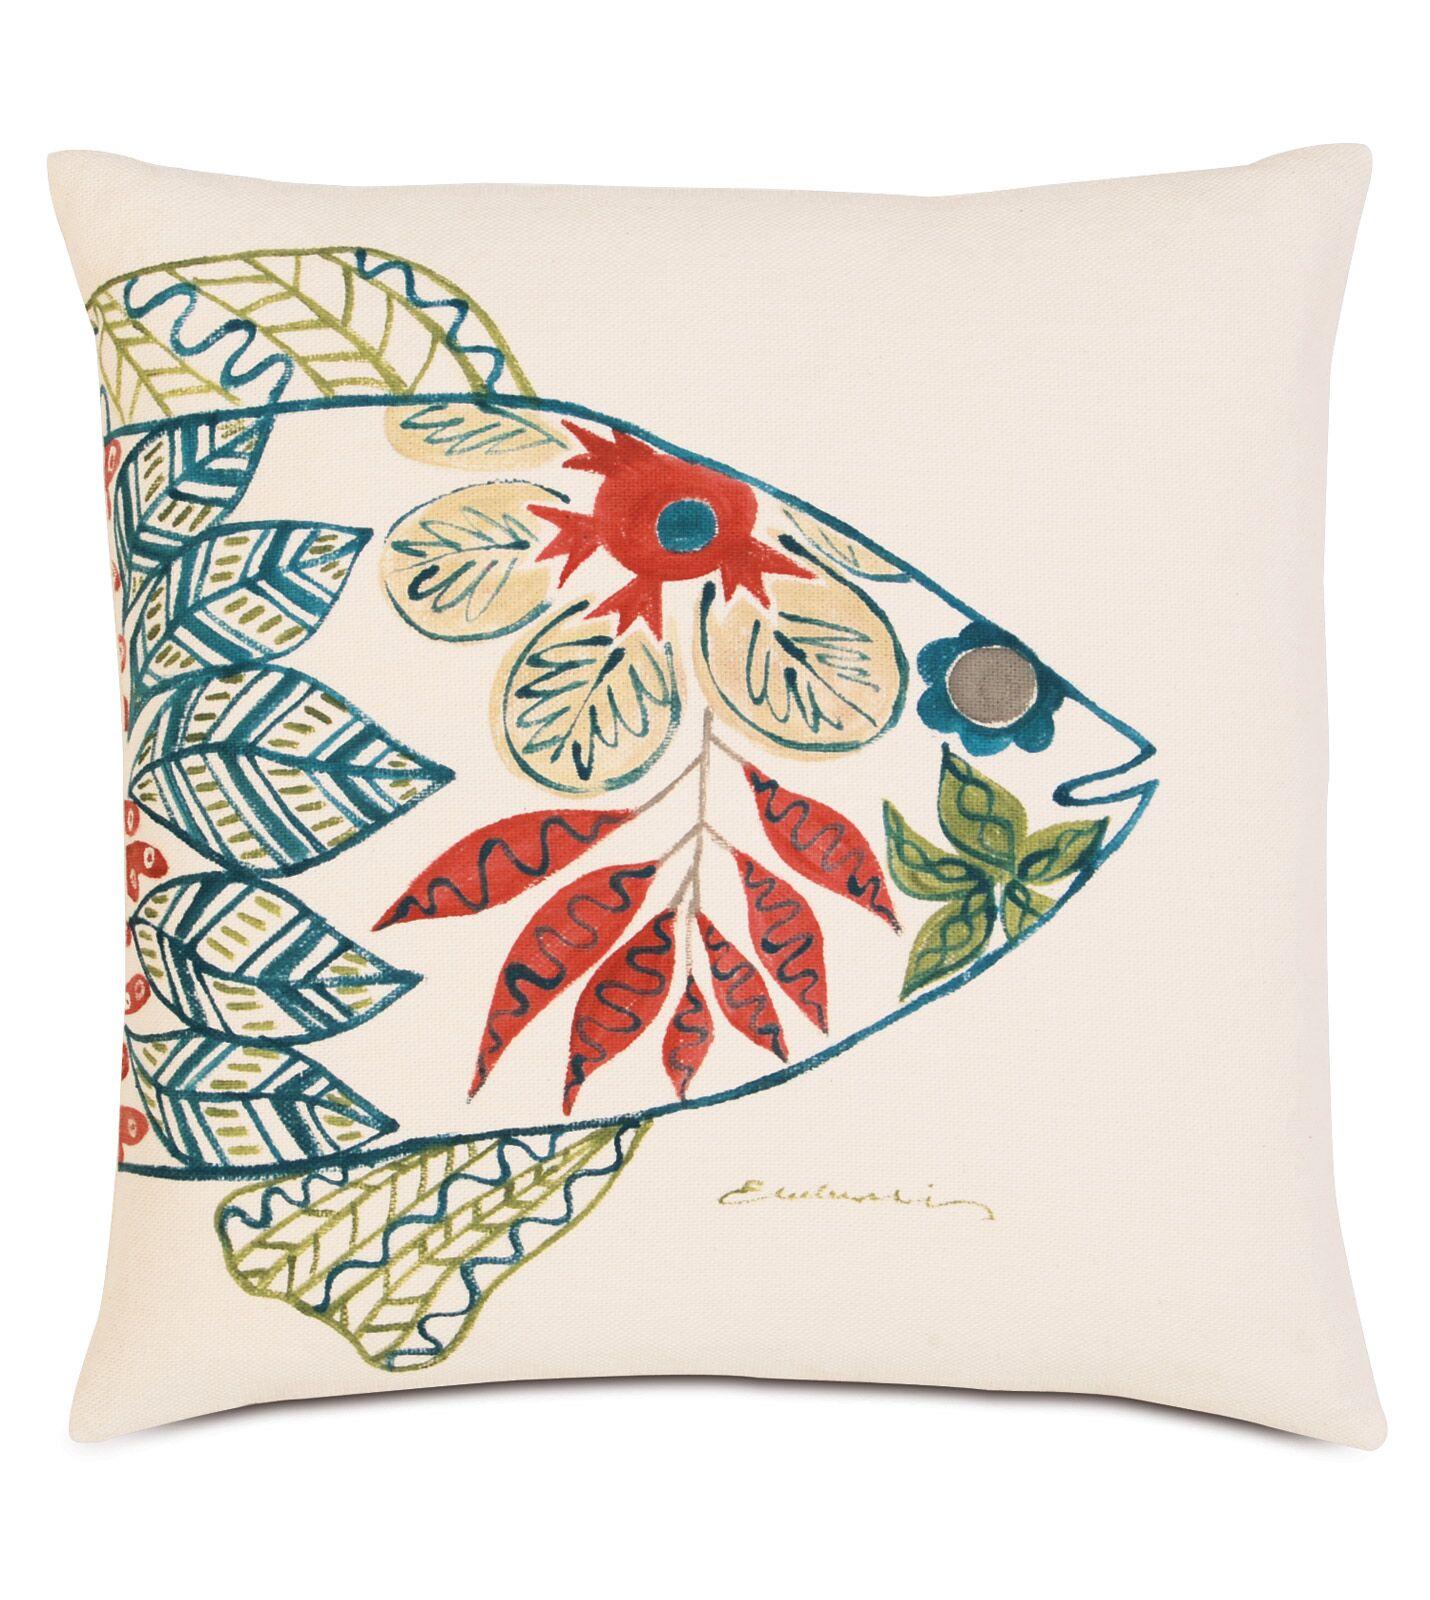 Suwanee Hand-Painted Fish Head Throw Pillow